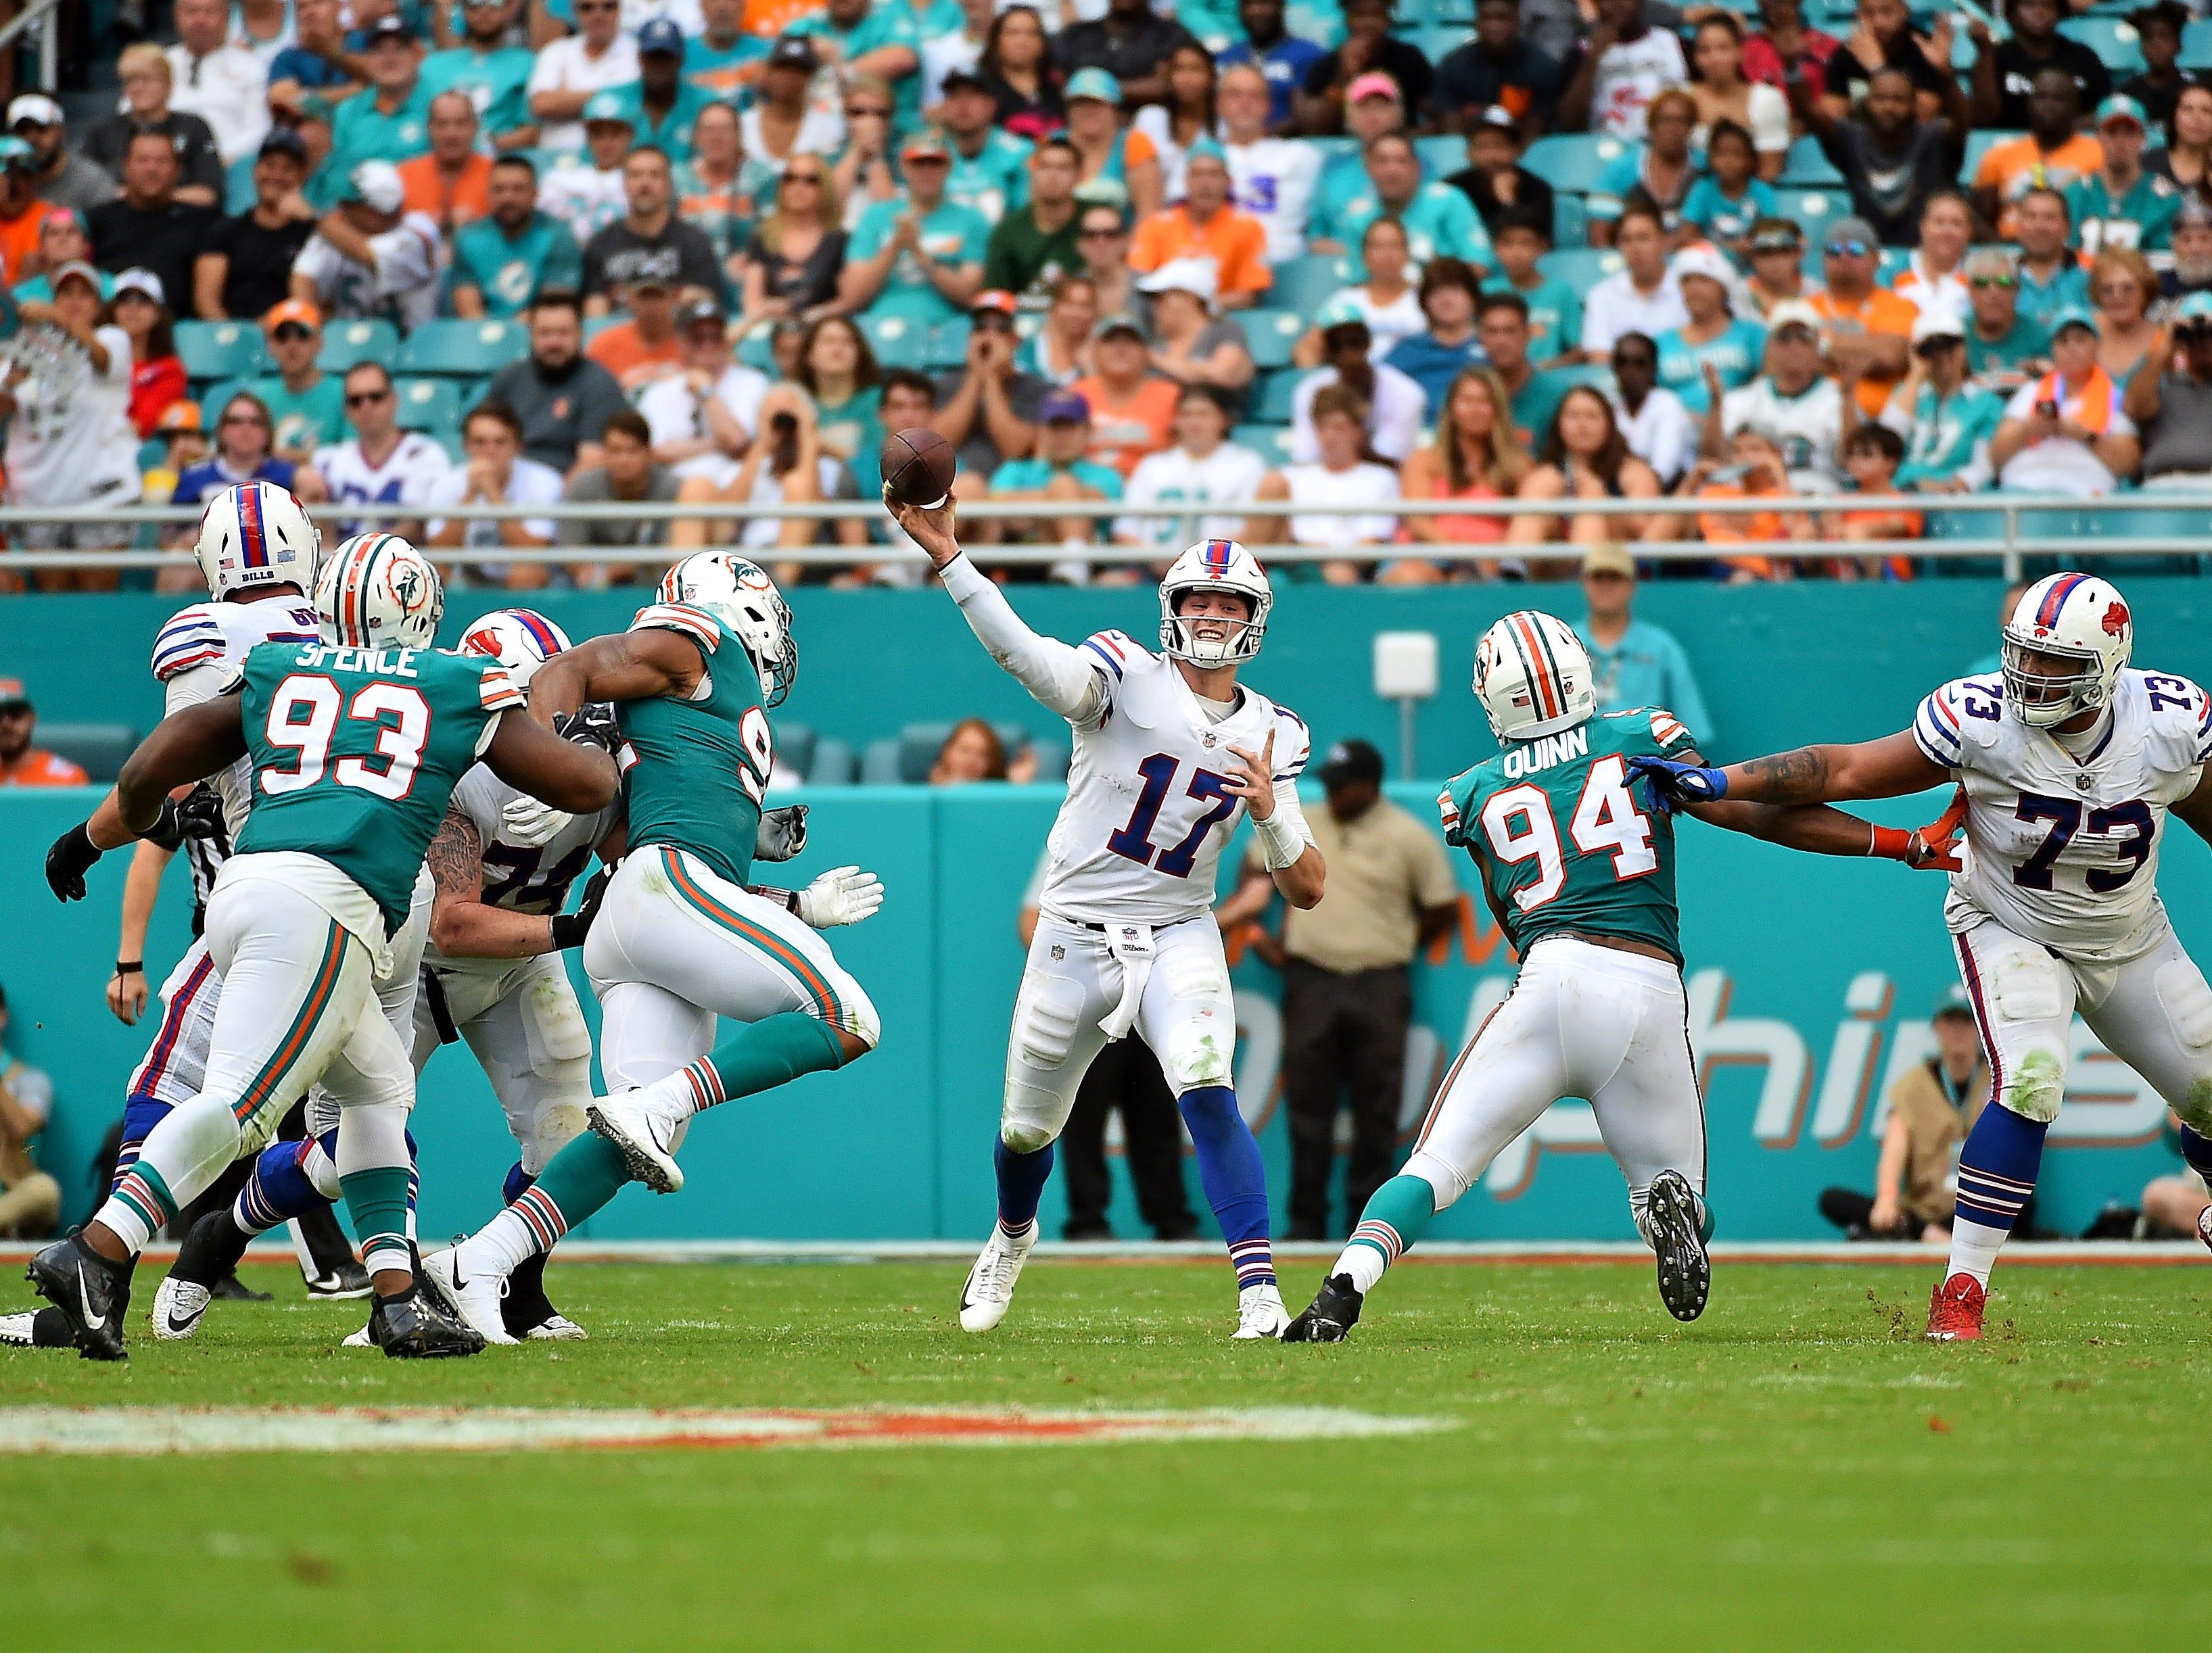 Dec 2, 2018; Miami Gardens, FL, USA; Buffalo Bills quarterback Josh Allen (17) attempts a pass against the Miami Dolphins during the first half at Hard Rock Stadium. Mandatory Credit: Jasen Vinlove-USA TODAY Sports